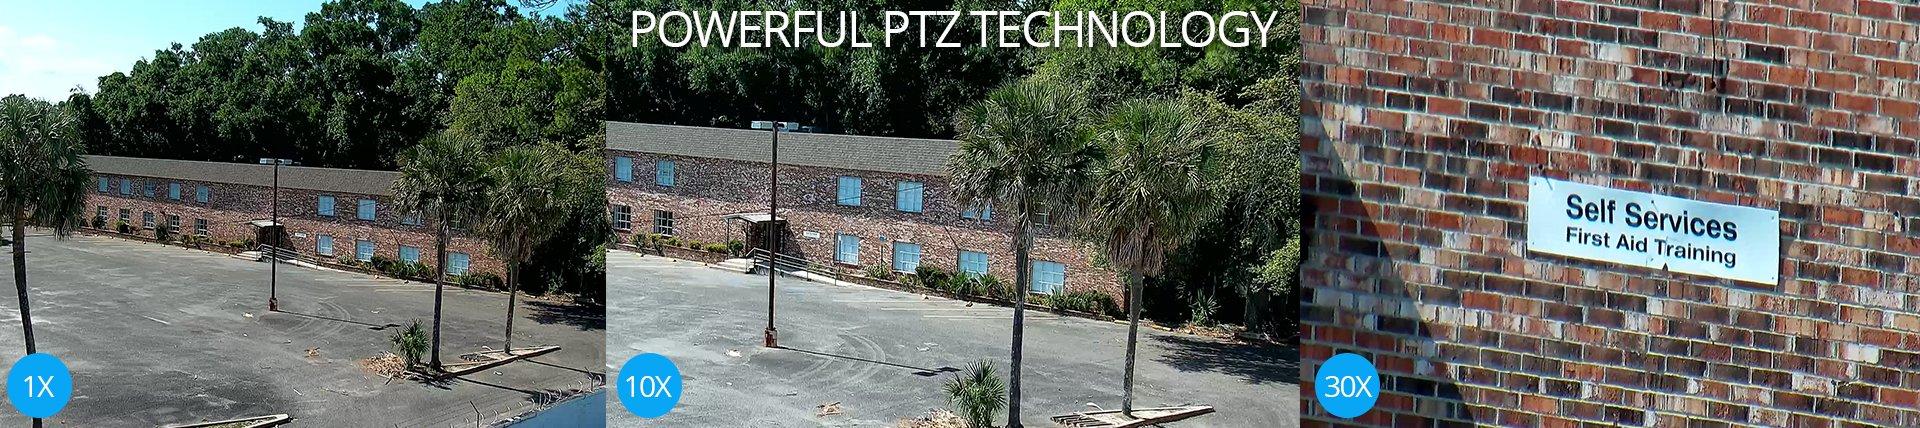 Pan Tilt Zoom PTZ Cameras